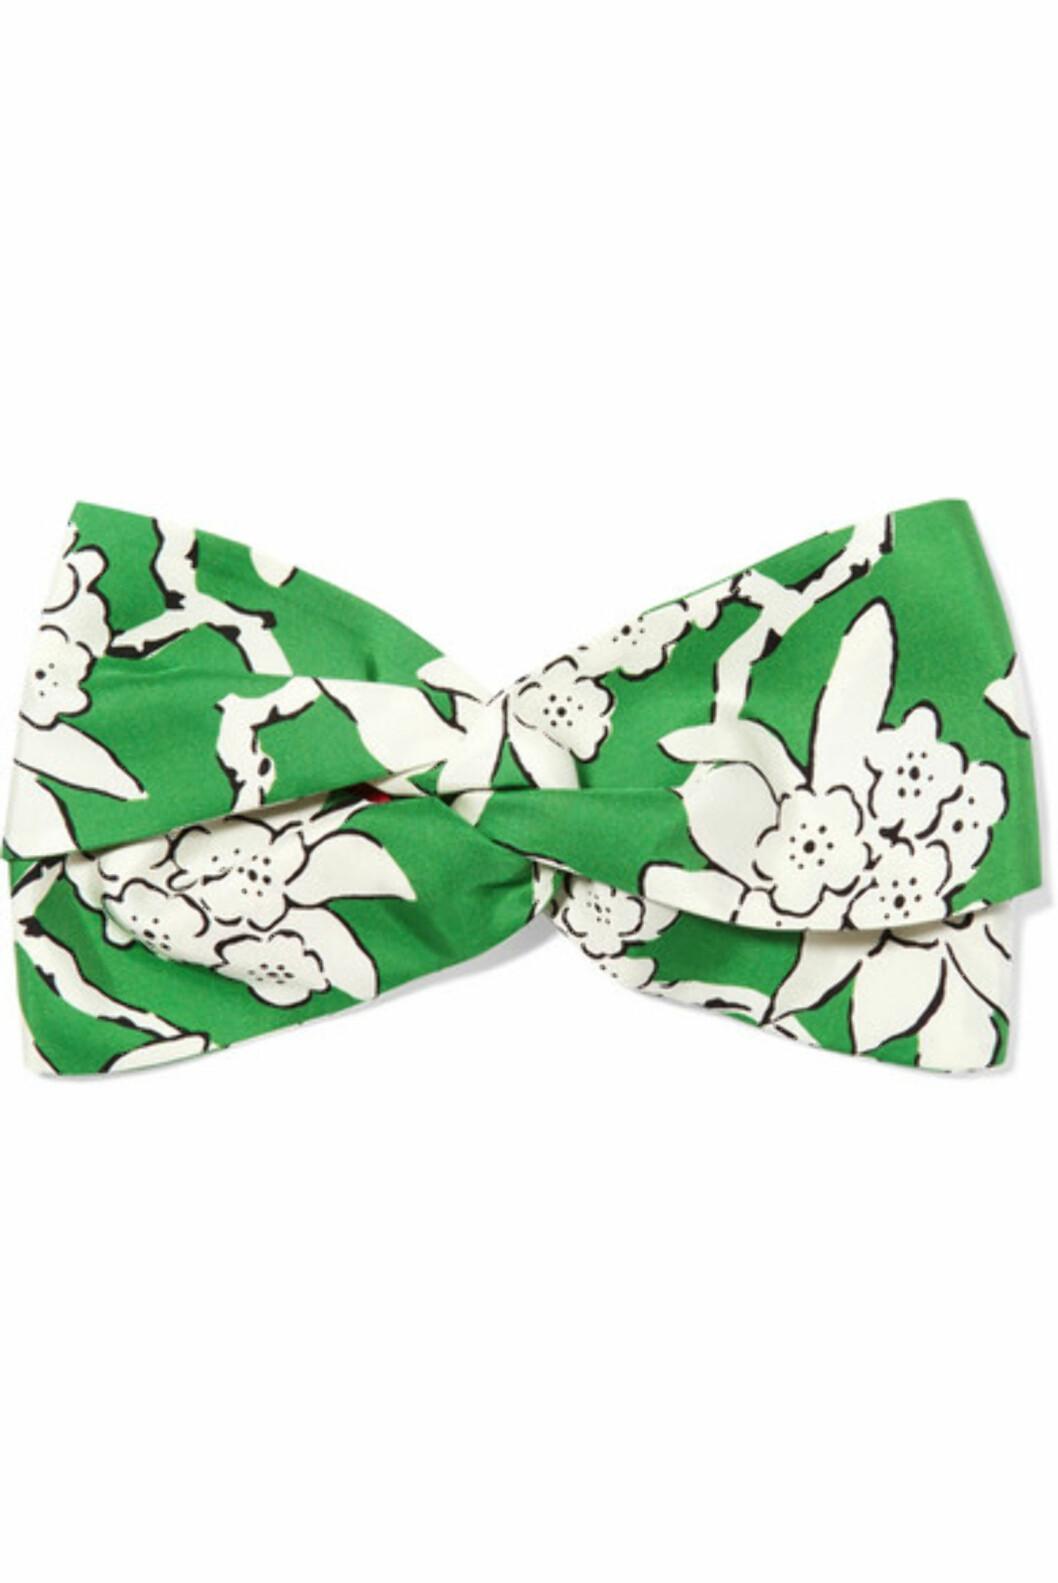 <strong>Hårbånd fra Valentino |2770,-| https:</strong>//www.net-a-porter.com/no/en/product/1037292/valentino/floral-print-silk-twill-headband